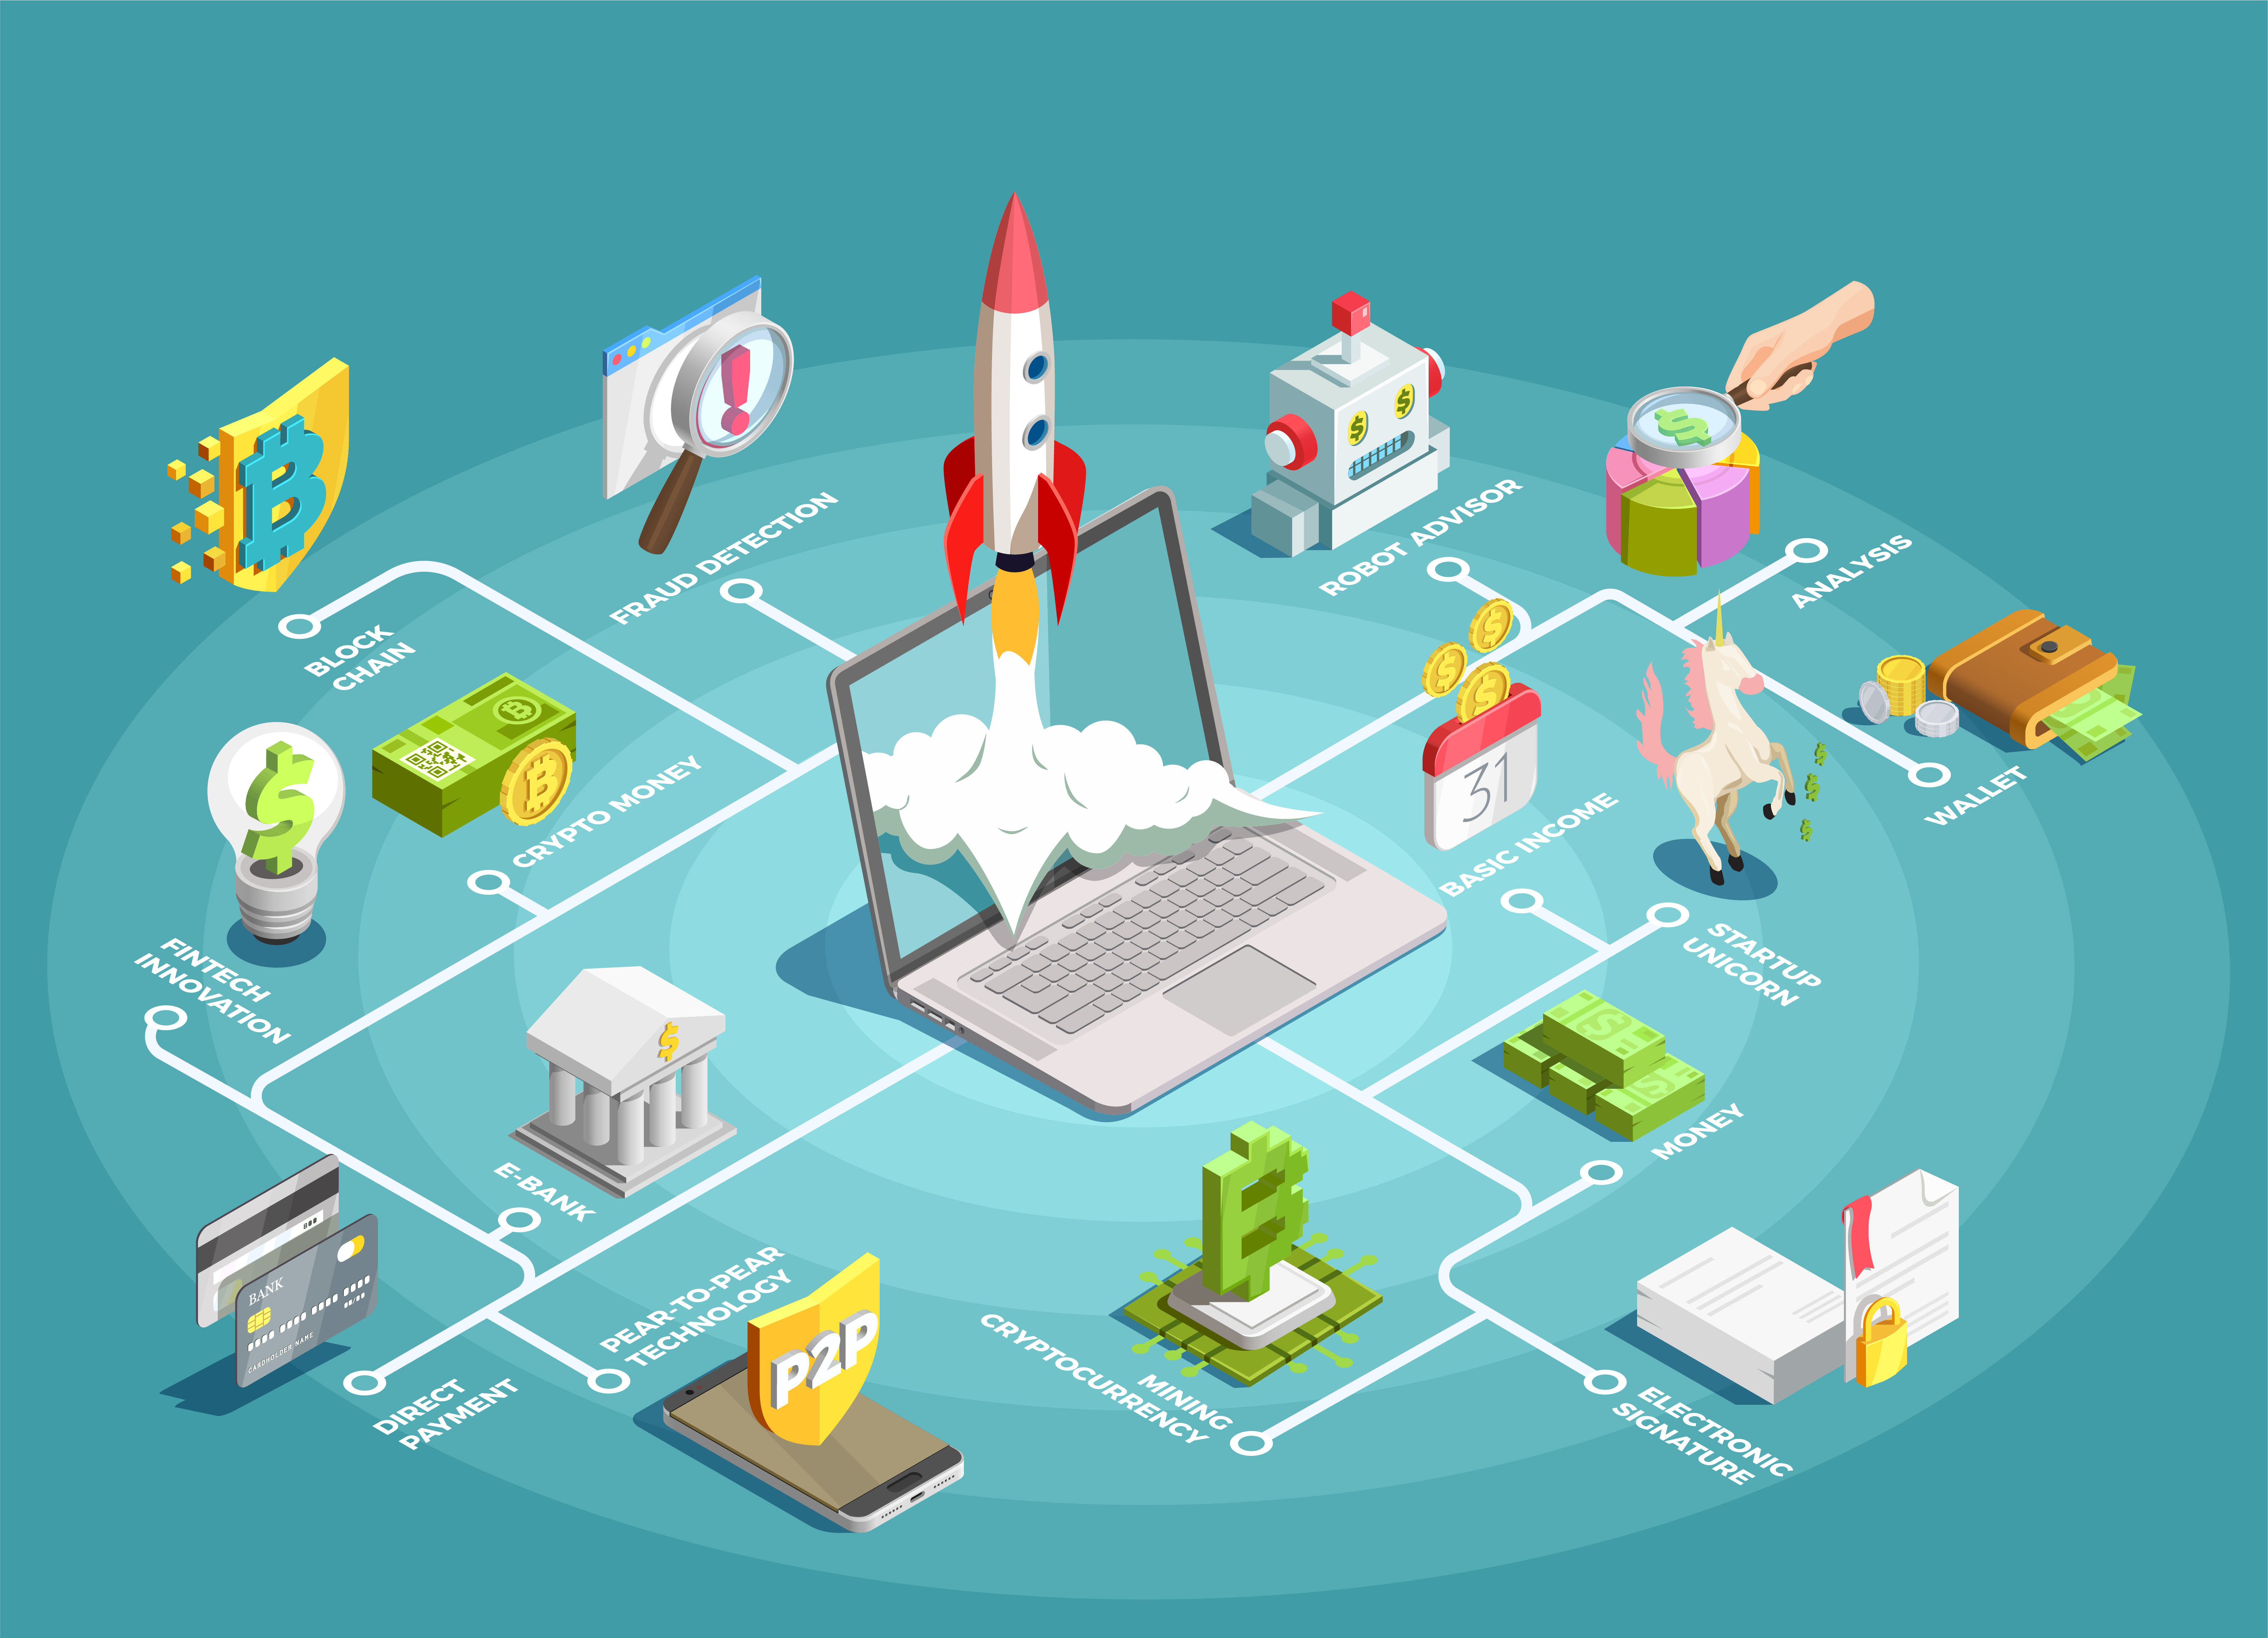 LatAm FinTech Expand Into New Markets